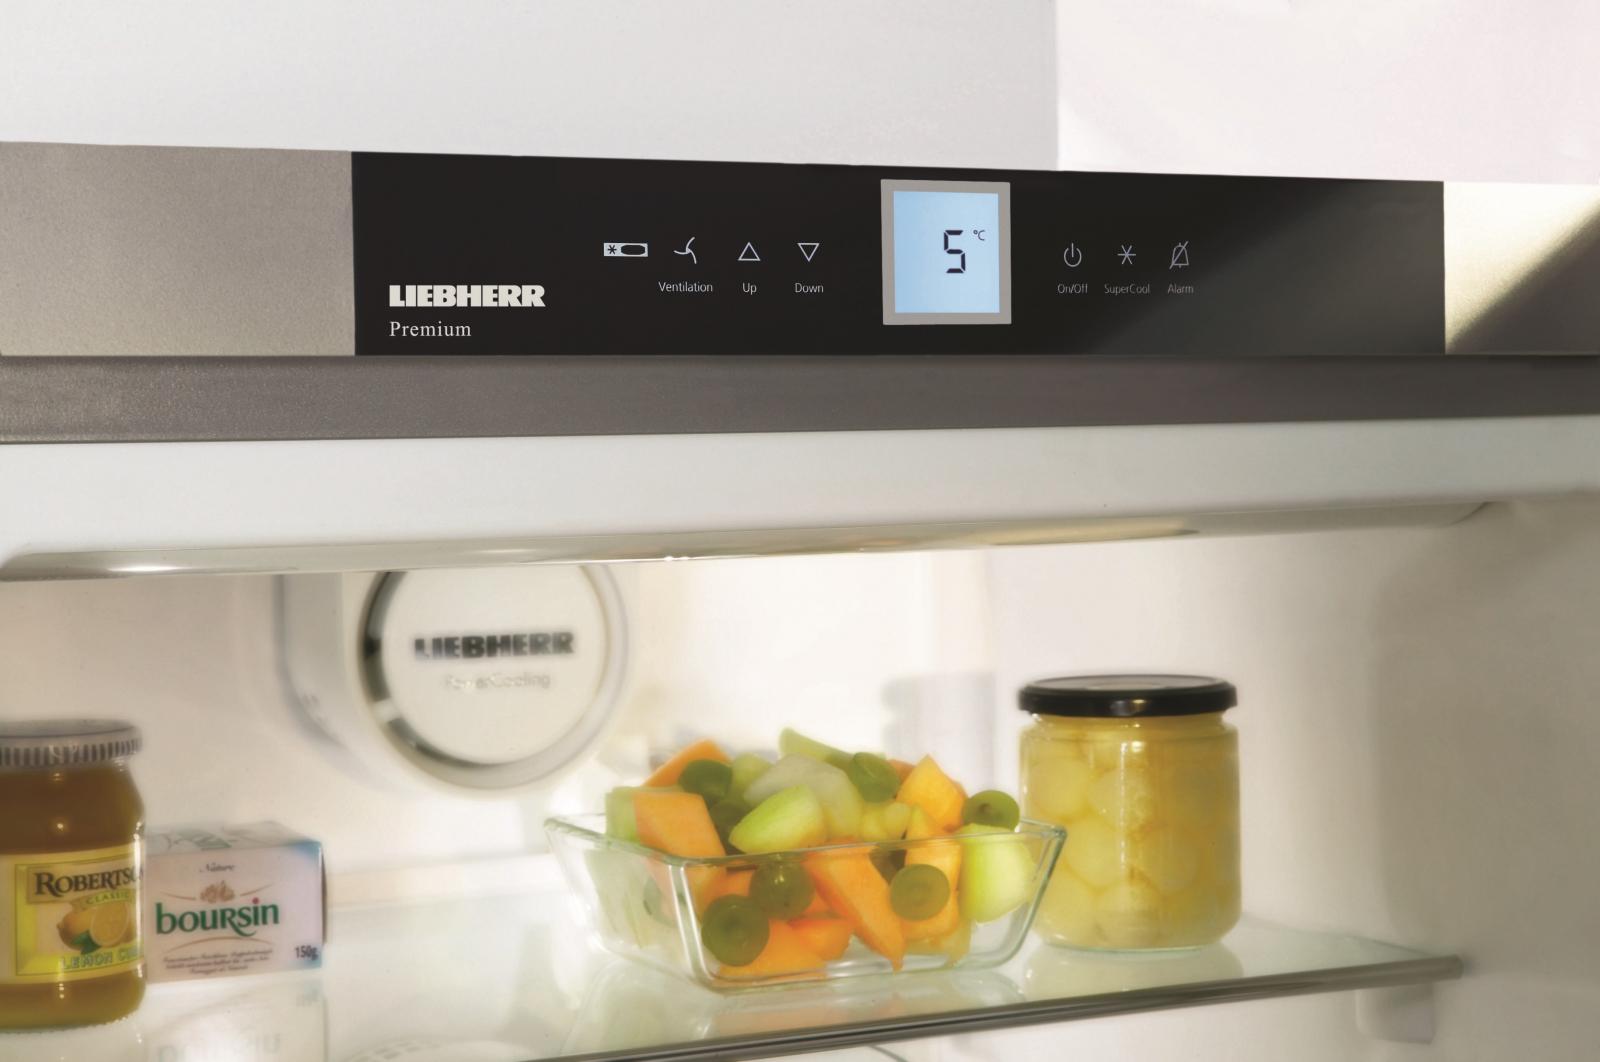 купить Side-by-Side холодильник Liebherr SBSbs 7353 Украина фото 2